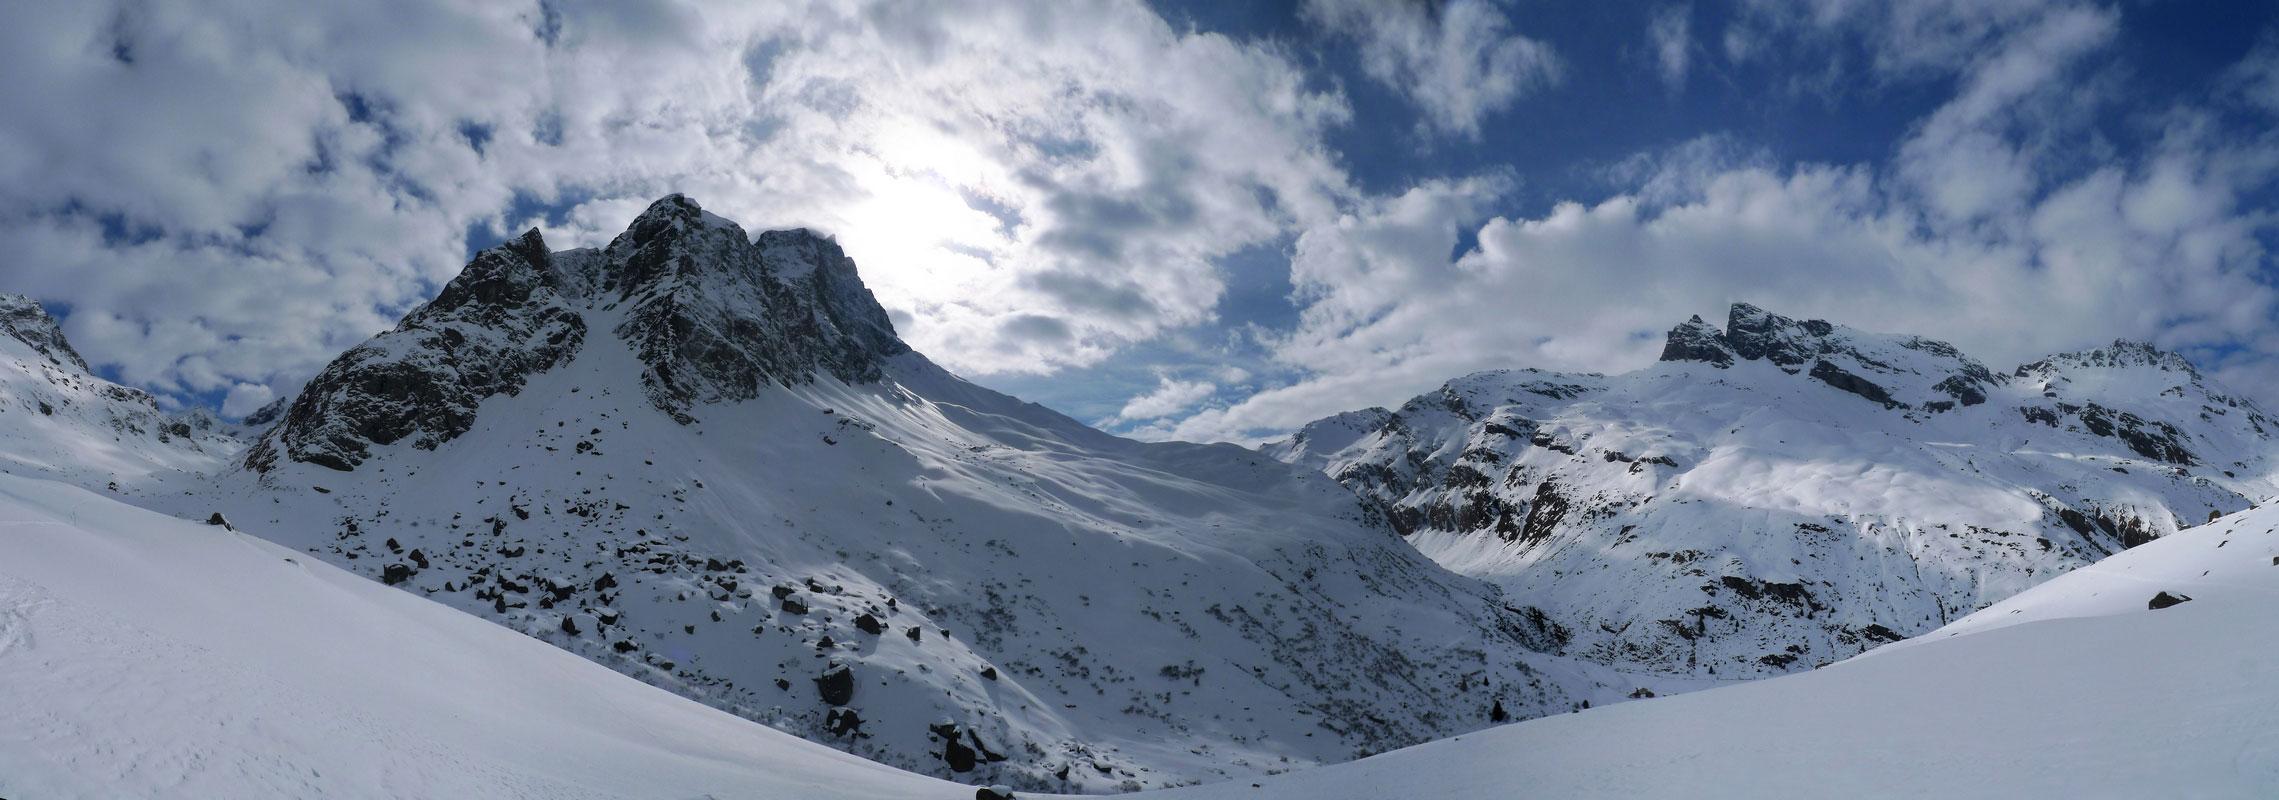 Piz Platta Plattagruppe / Oberhalbstein Switzerland panorama 54